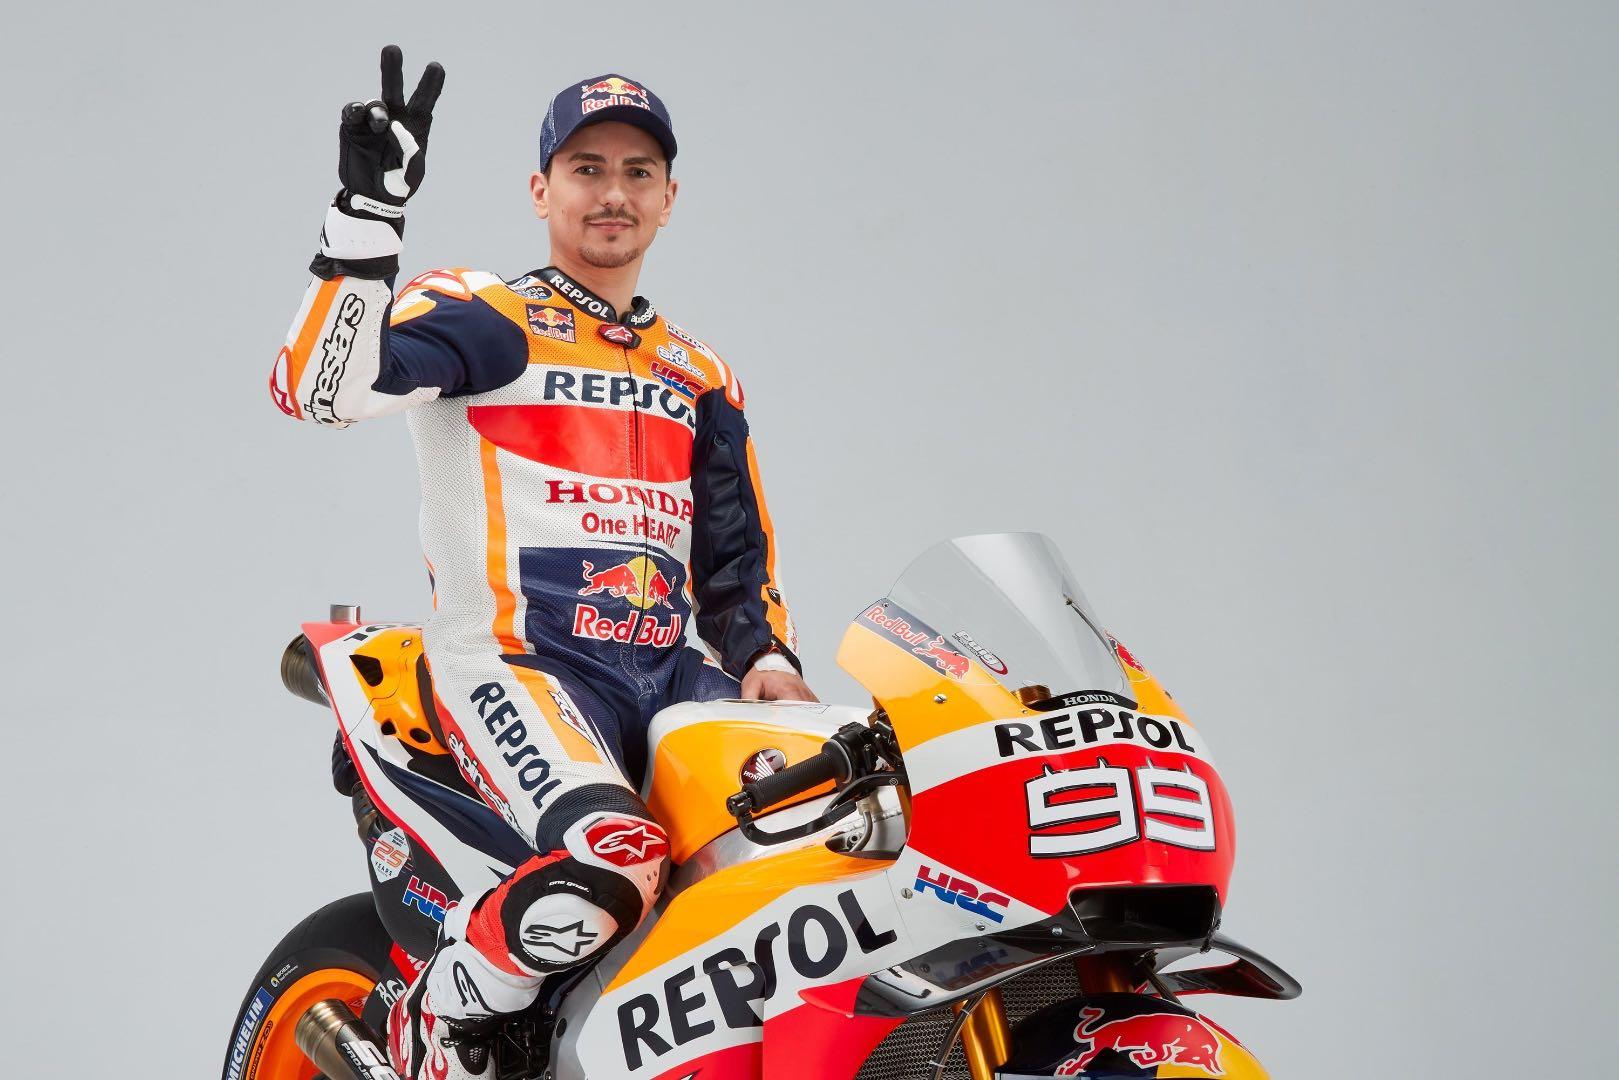 MotoGP Champ Jorge Lorenzo Announces Retirement from Racing